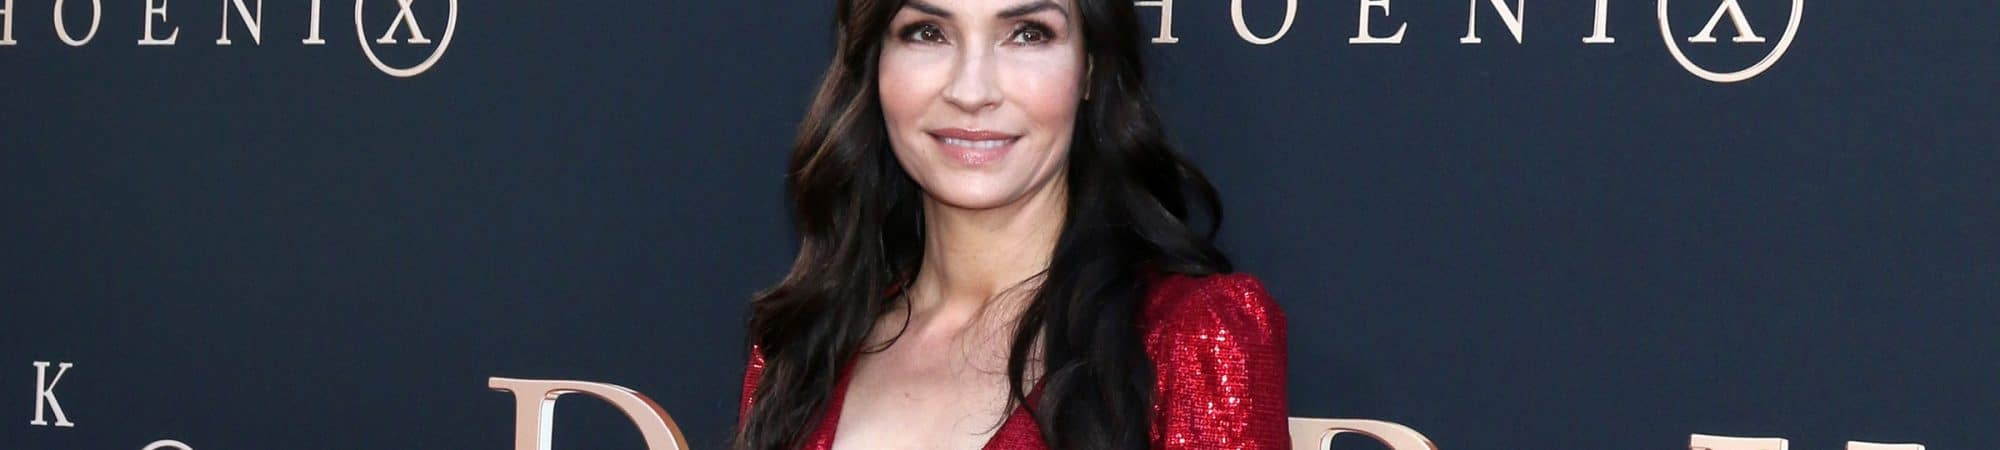 "Famke Janssen na estreia mundial de ""Dark Phoenix"", em junho de 2019 em Los Angeles. Imagem: Kathy Hutchins/Shutterstock"